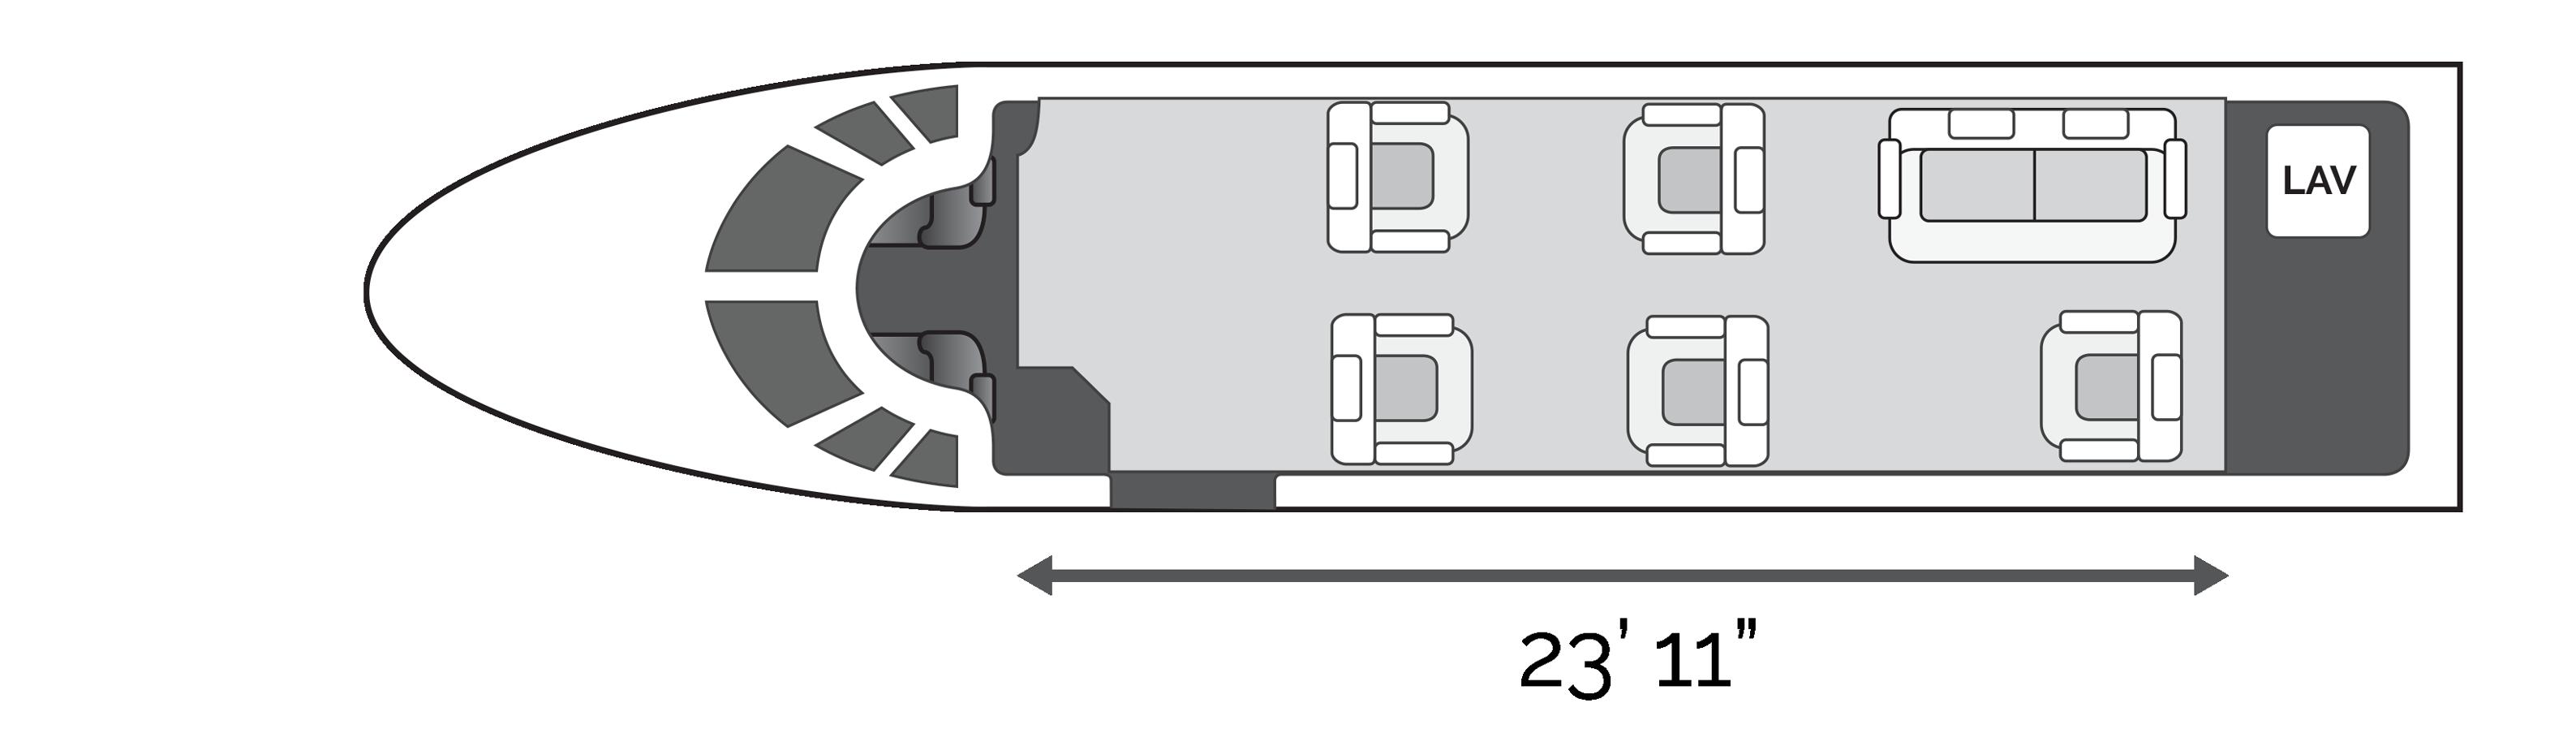 SimpleCharters Midsize Jet Cabin